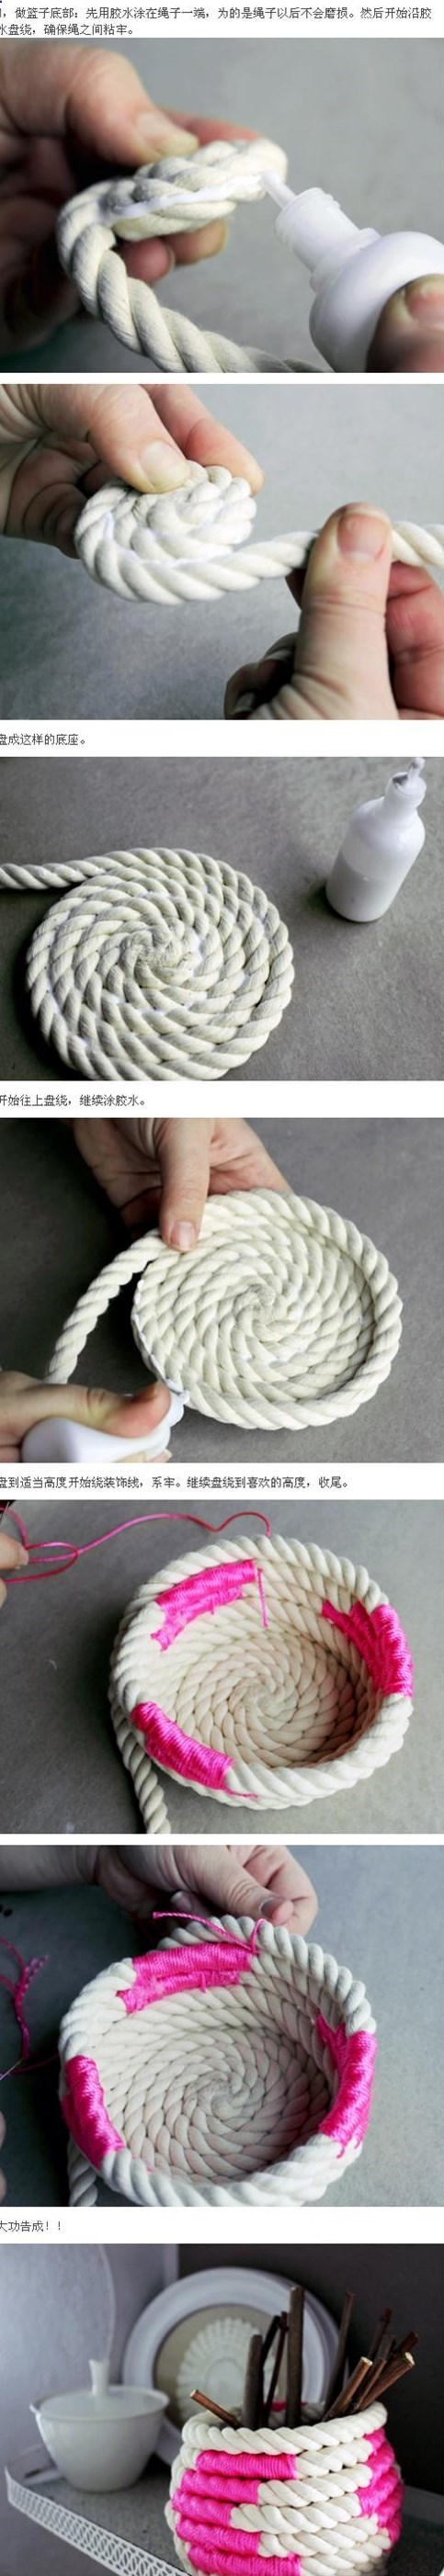 Rope bowl. Love it!